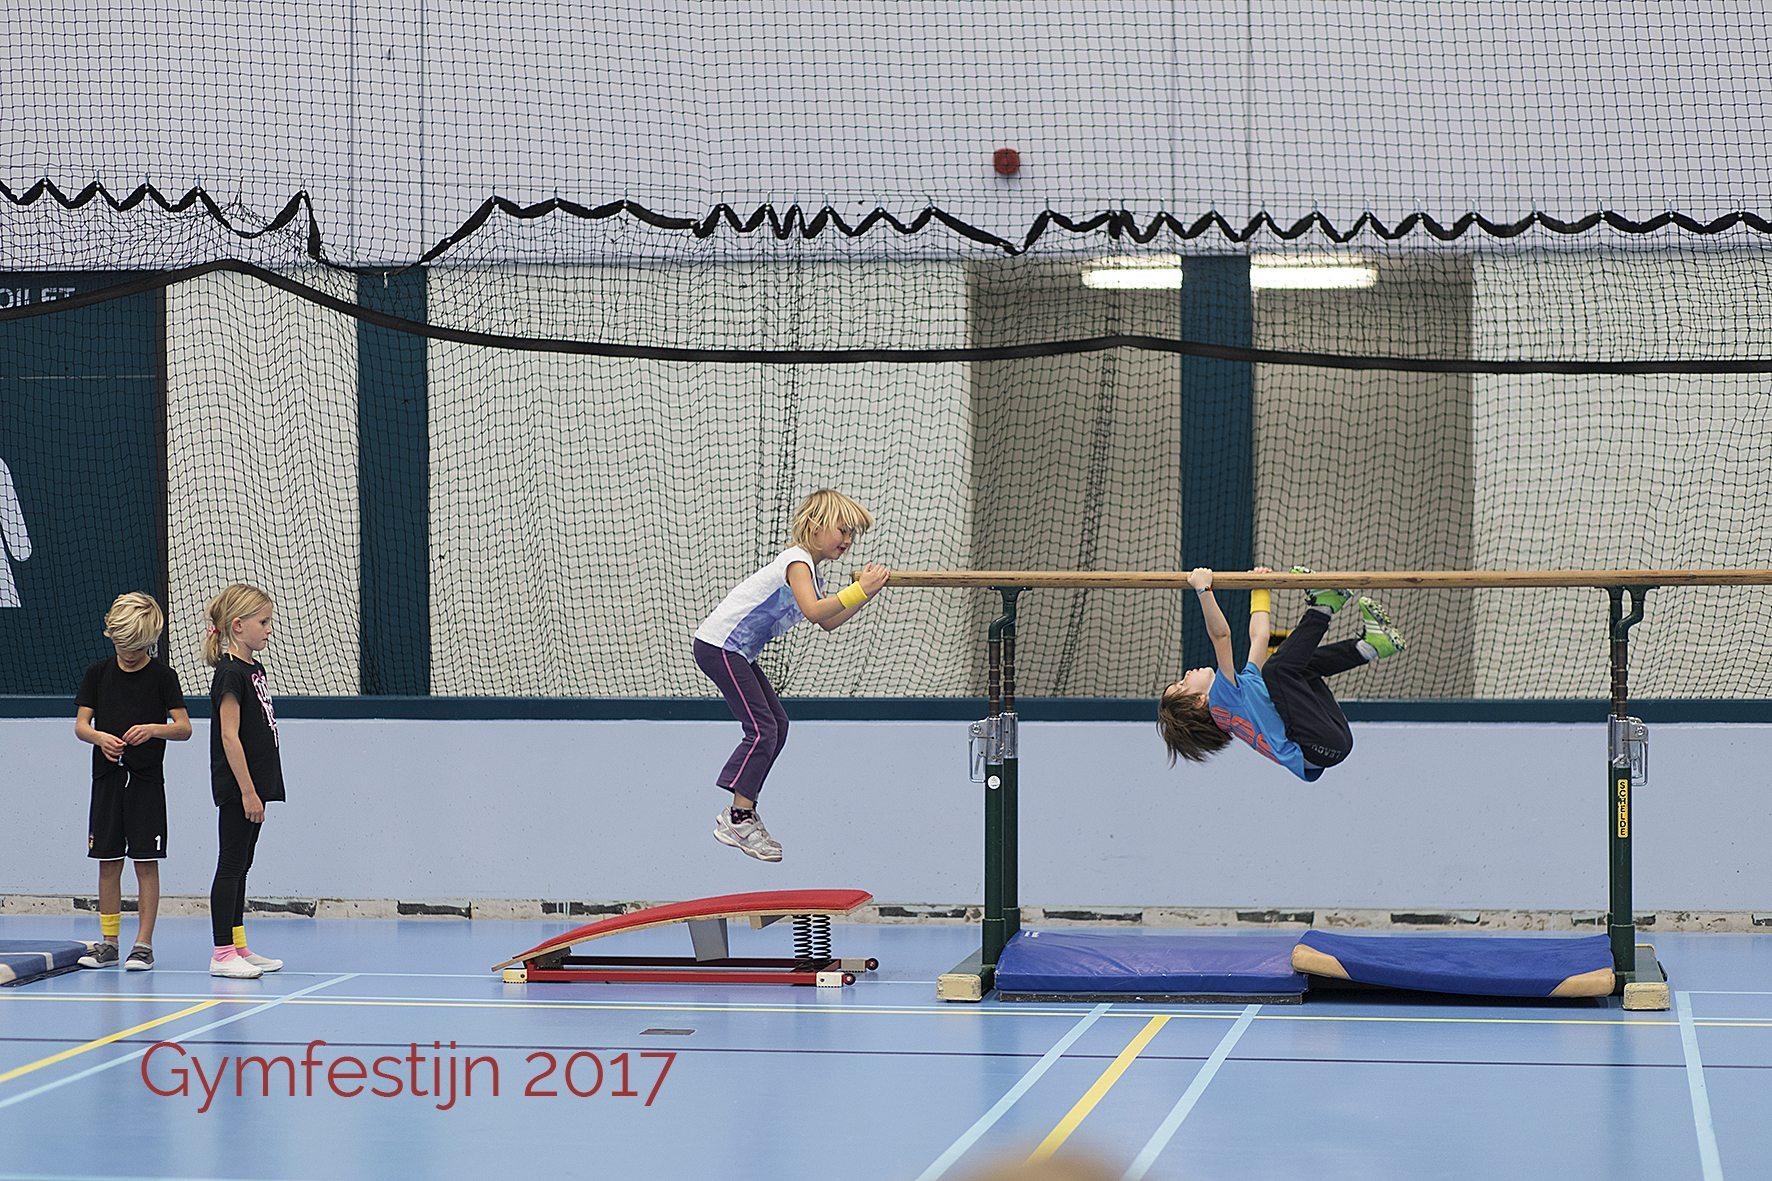 Gymfestijn 2017